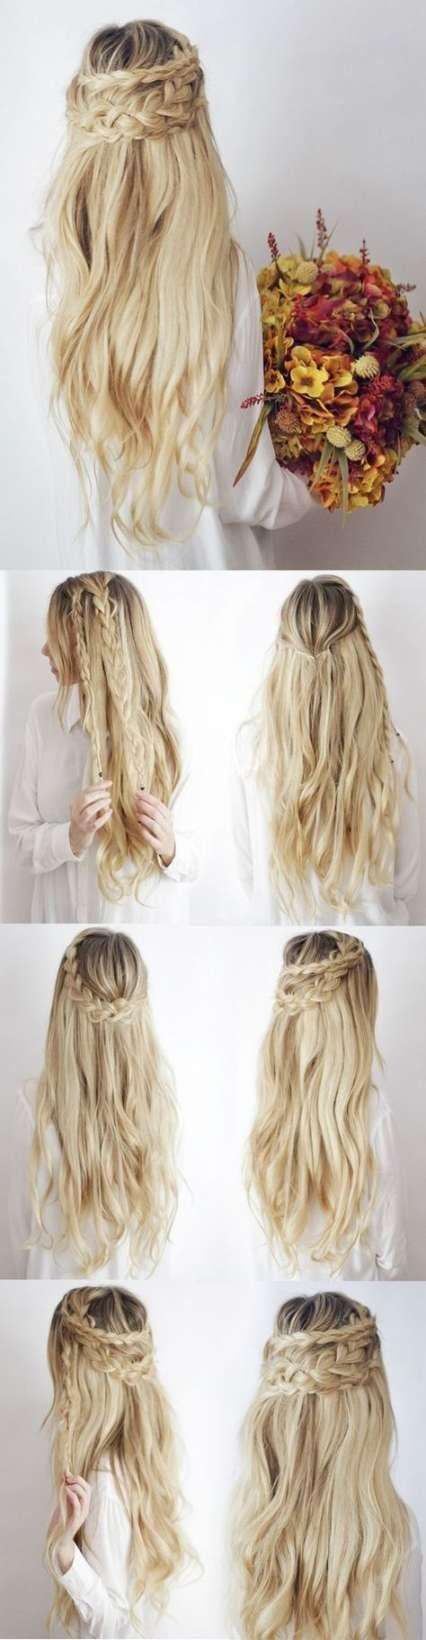 Hair braids long coiffures 65+ ideas for 2019